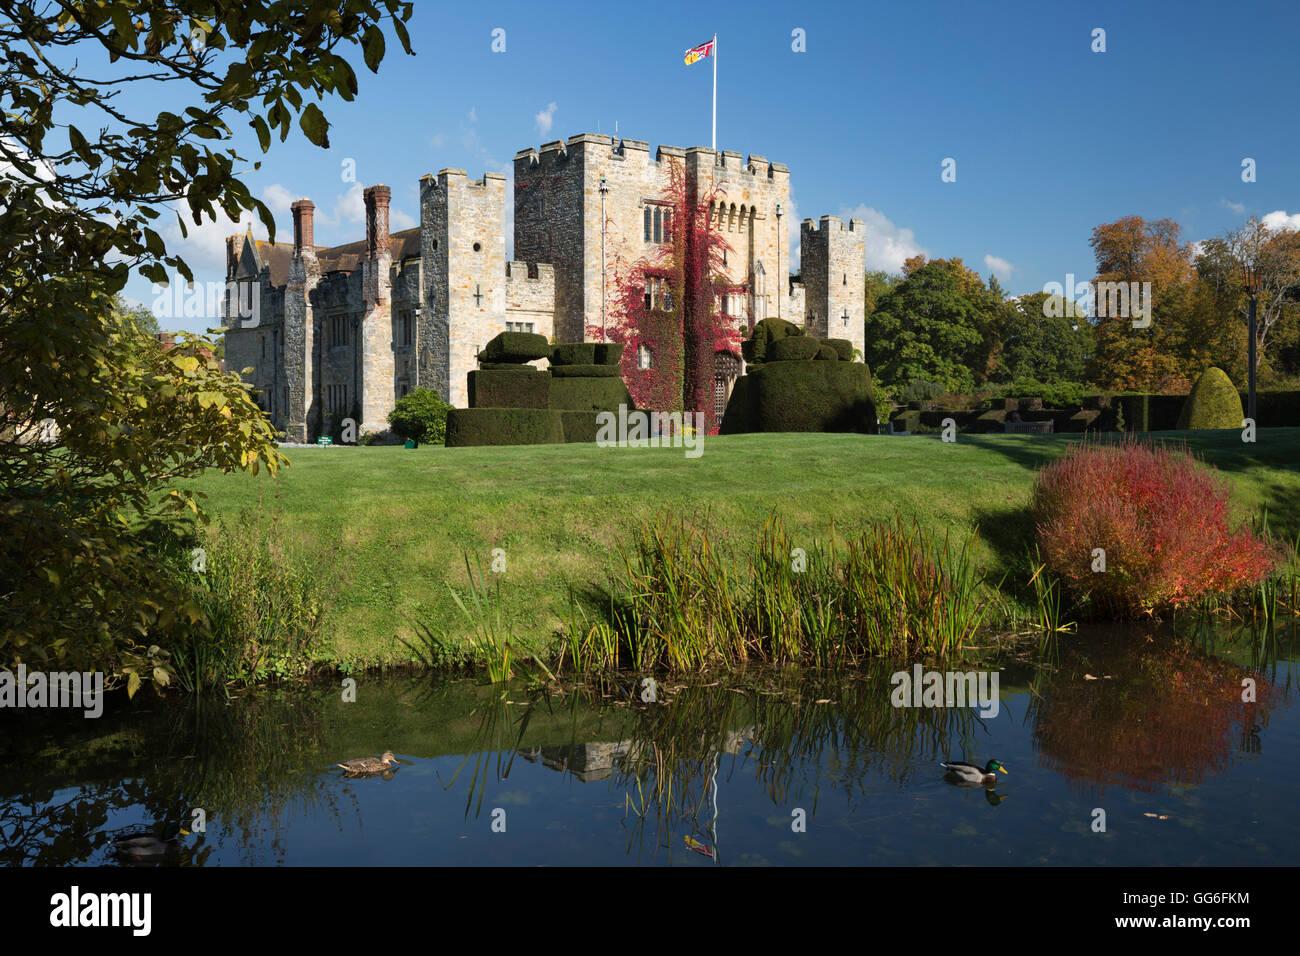 Hever Castle and gardens, Hever, Kent, England, United Kingdom, Europe - Stock Image